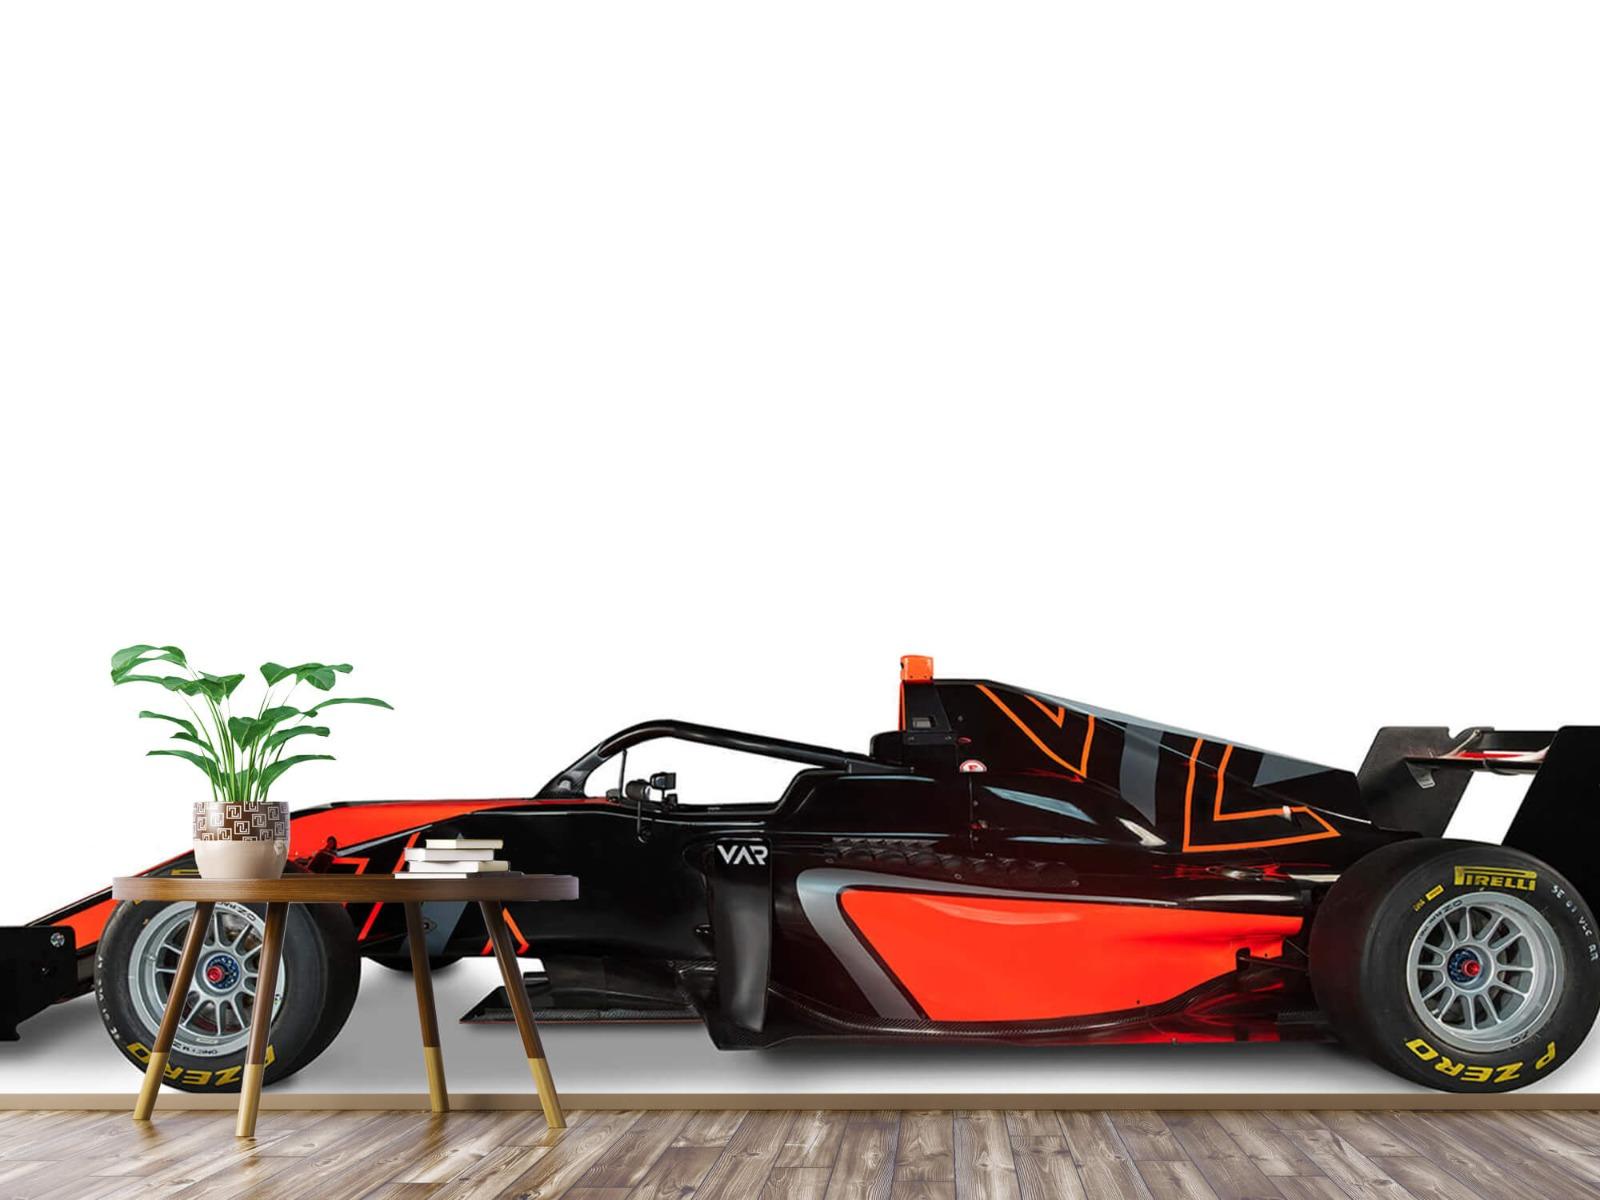 Sportauto's - Formule 3 - Lower side view - Computerruimte 4